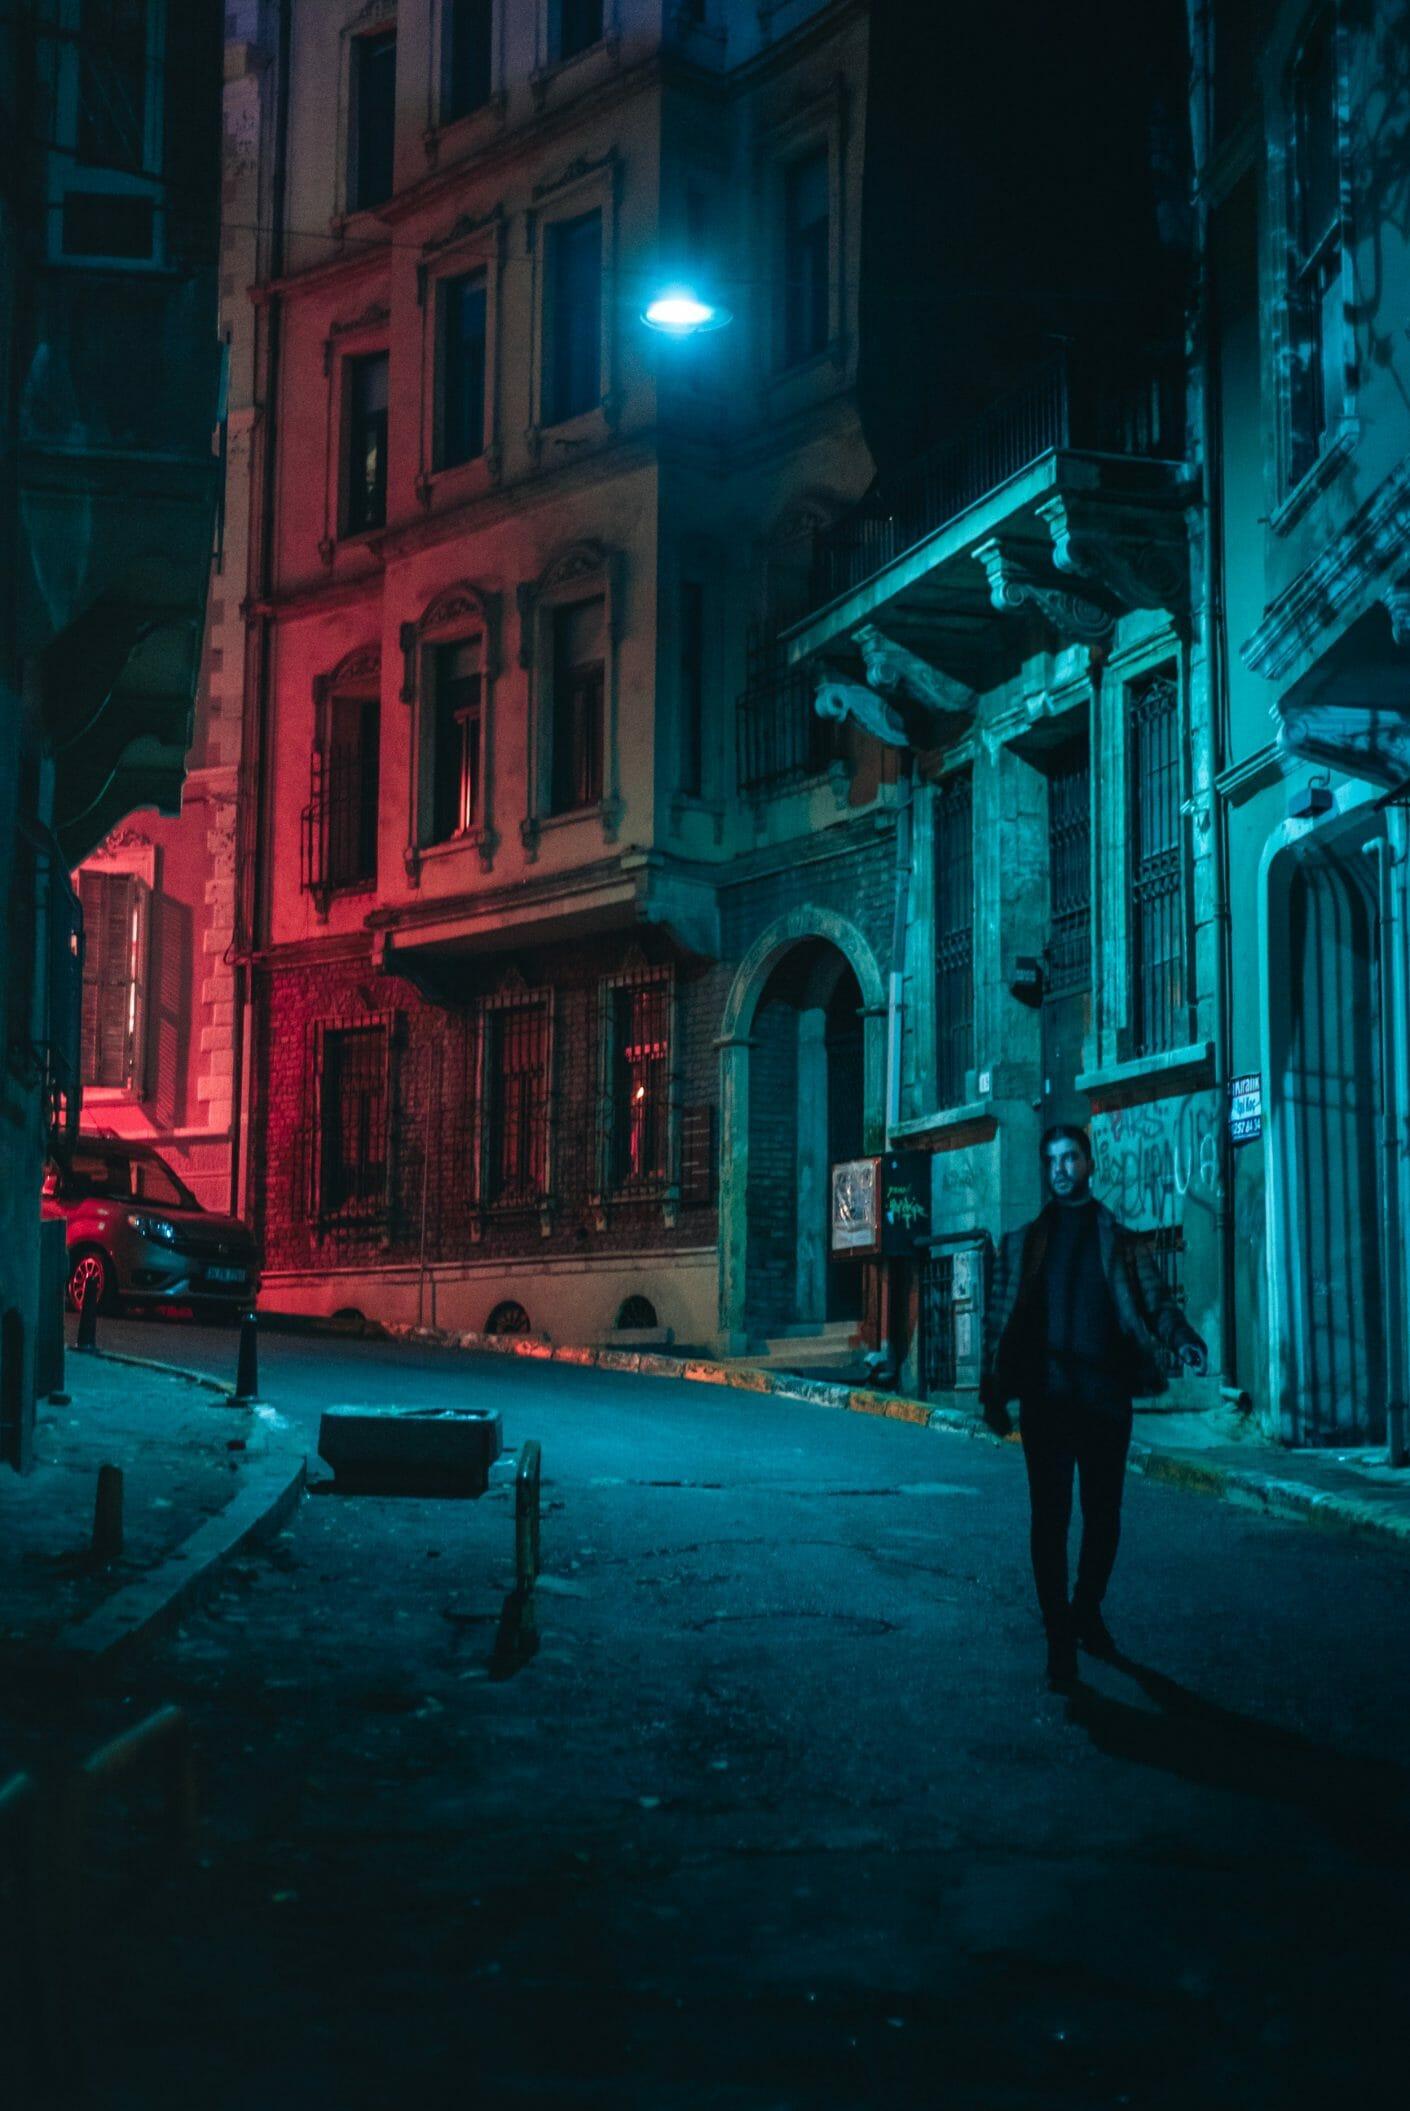 """I Got Lost in Istanbul at Night"" ou les rêveries d'un promeneur solitaire par Hamza Benkirane 1"